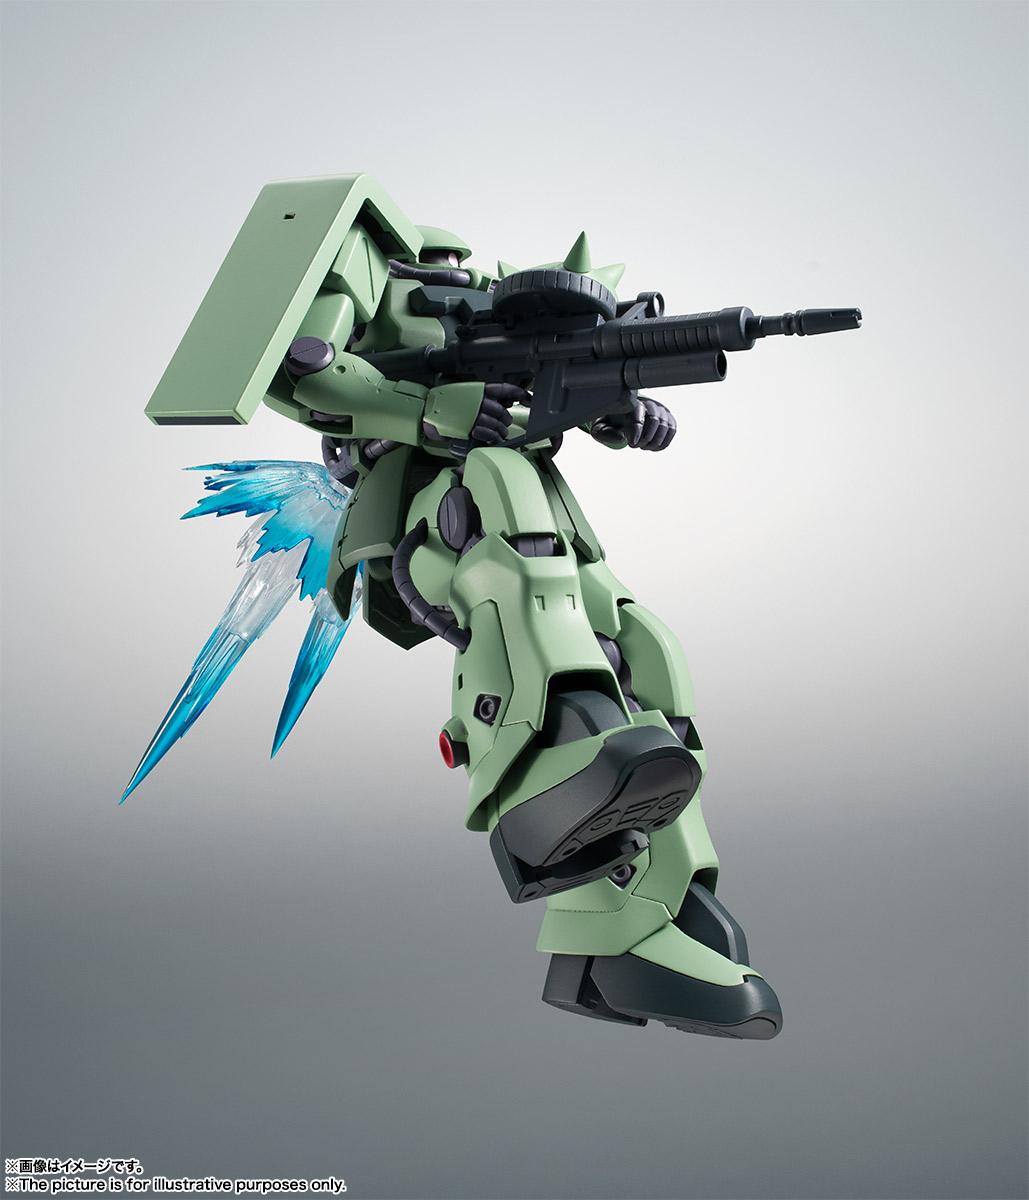 ROBOT魂〈SIDE MS〉『MS-06F-2 ザクII F2型 ver. A.N.I.M.E.』機動戦士ガンダム0083 可動フィギュア-012